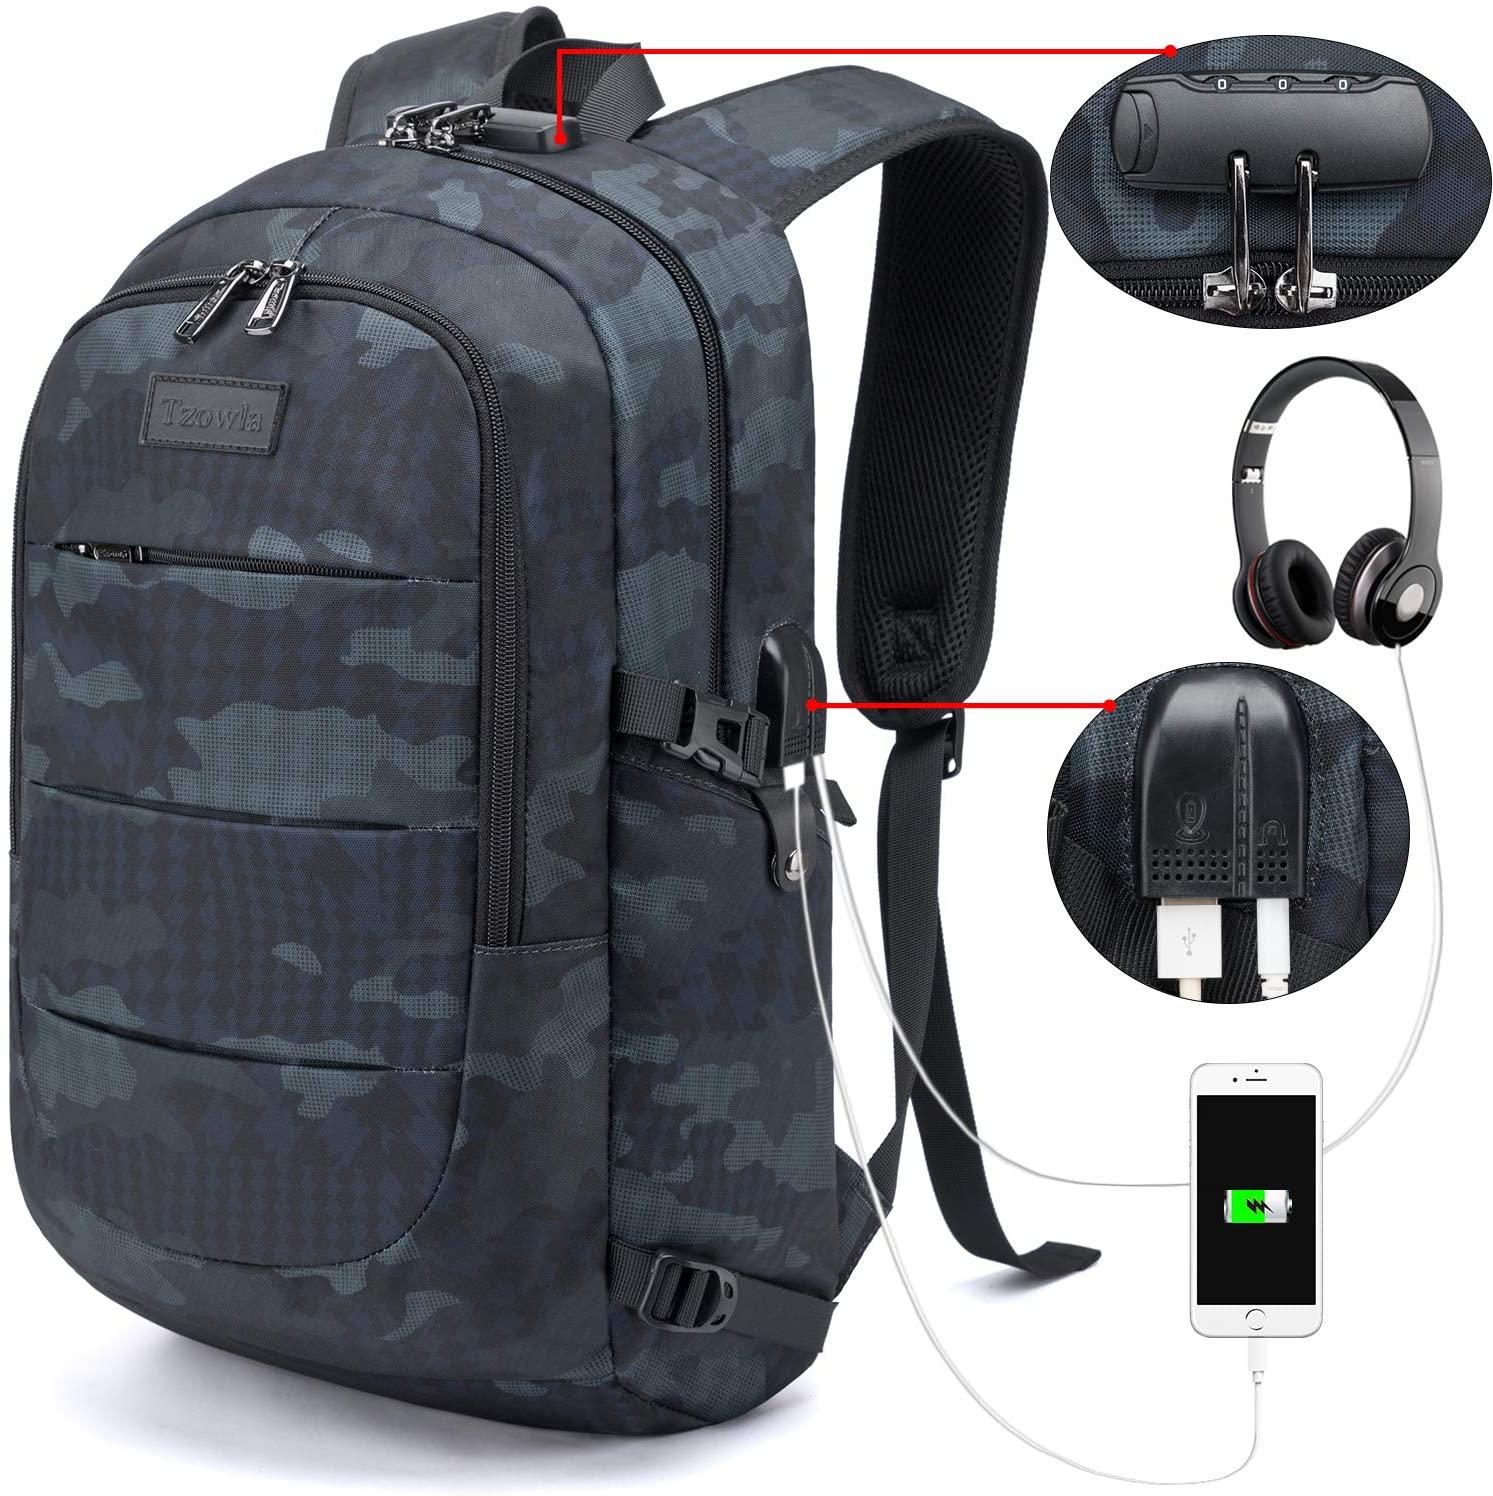 Mochila con cargador USB para dispositivos, resistente al agua.